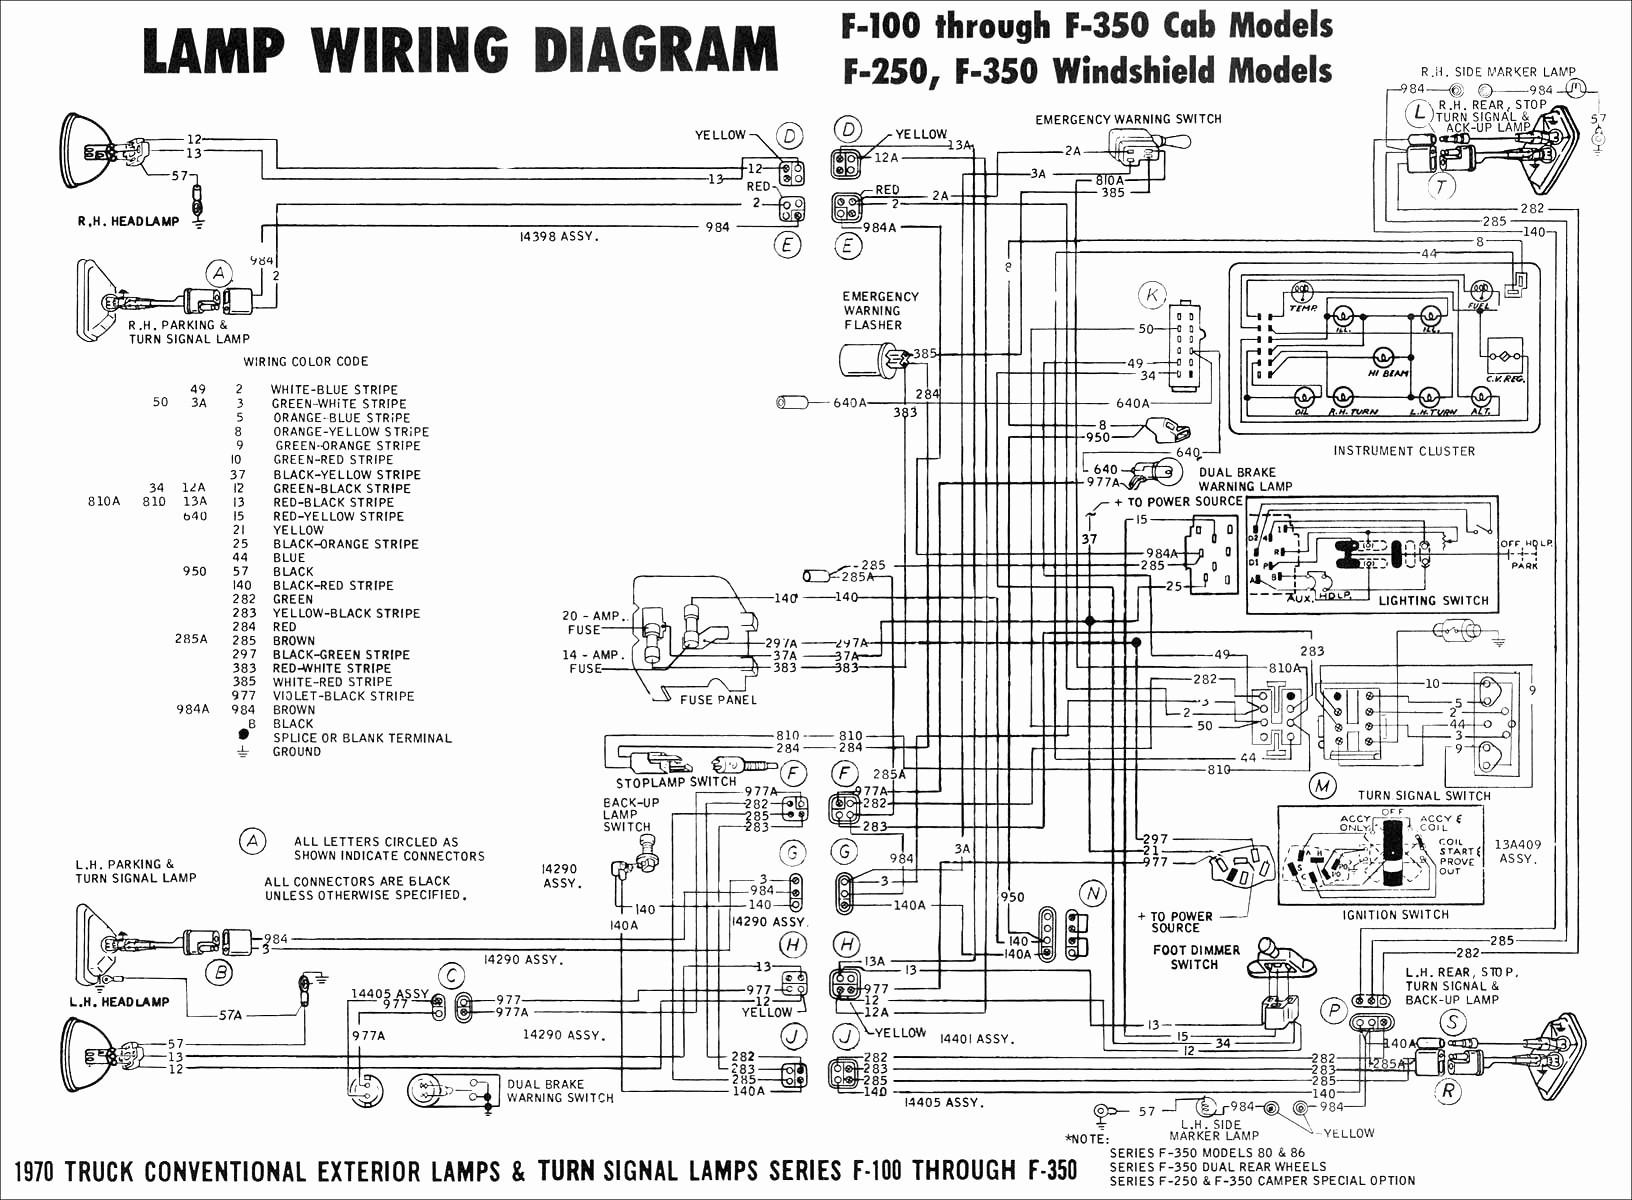 International Truck Wiring Diagram 1995 E250 Wire Schematics Another Blog About Wiring Diagram • Of International Truck Wiring Diagram